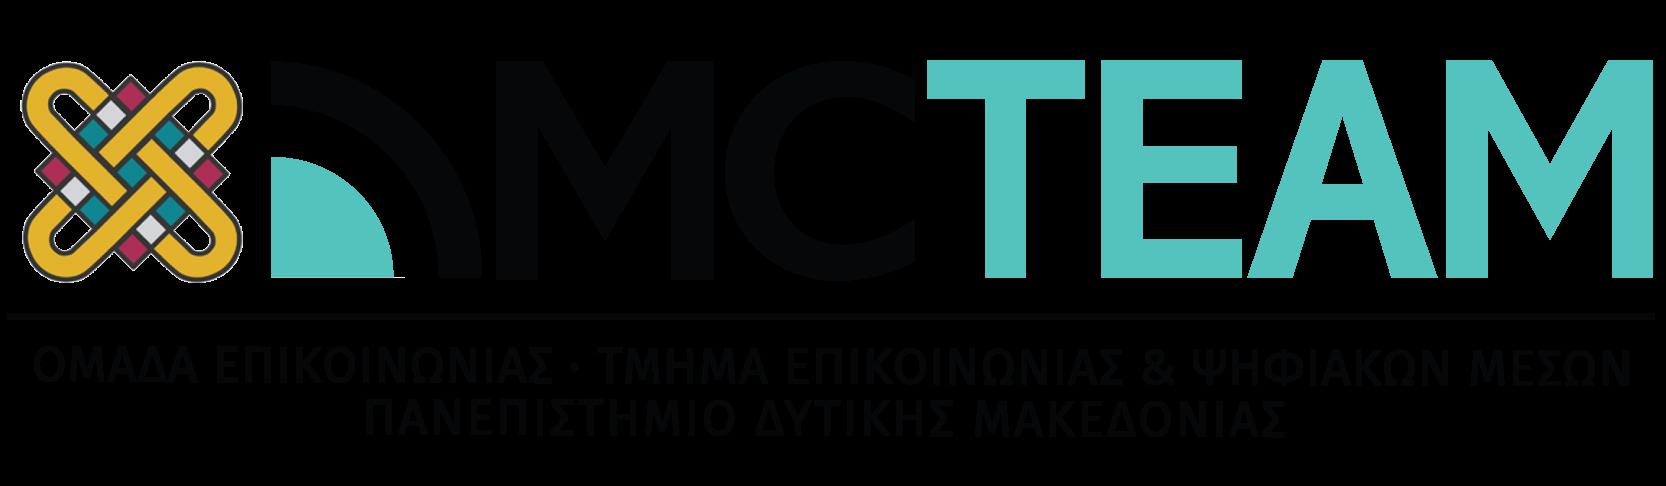 DMC TEAM